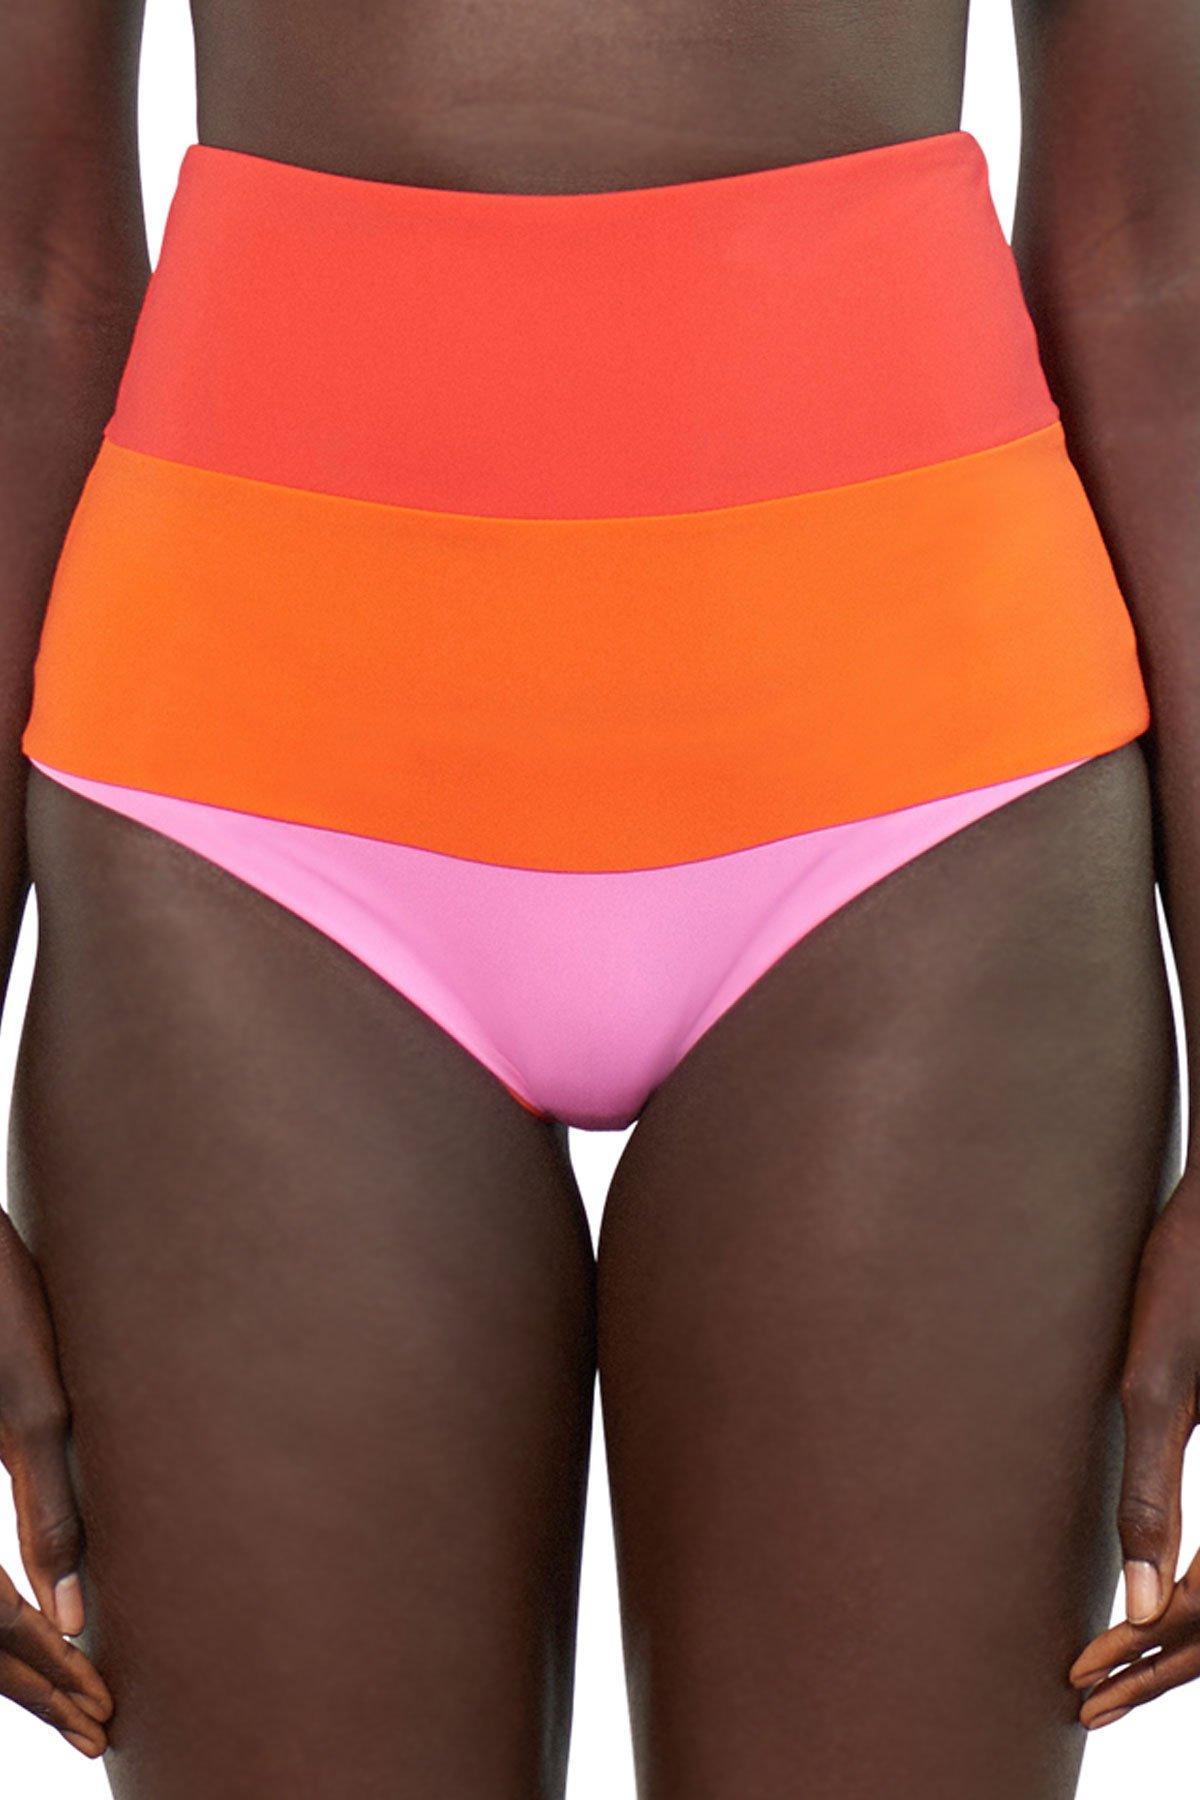 Mara Hoffman Women's Sunrise Colorblock High Waist Bottom Multi S